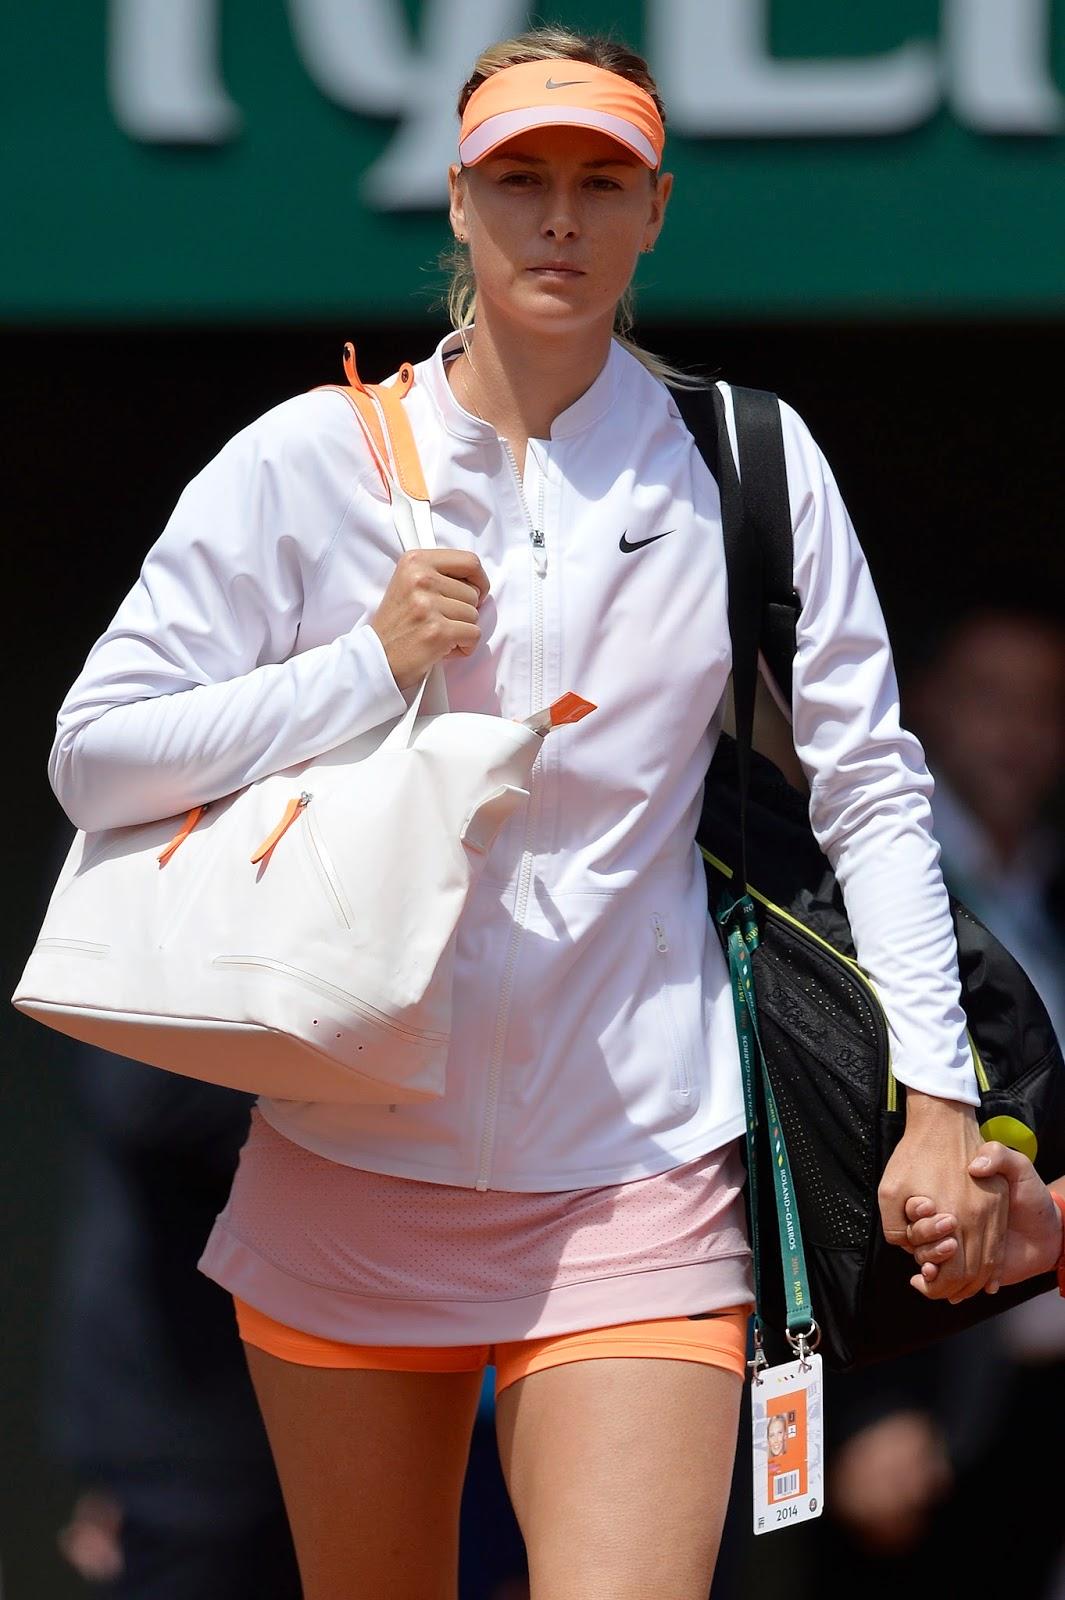 Maria Sharapova HD Pictures | Tennis Star Maria Sharapova HD Wallpapers